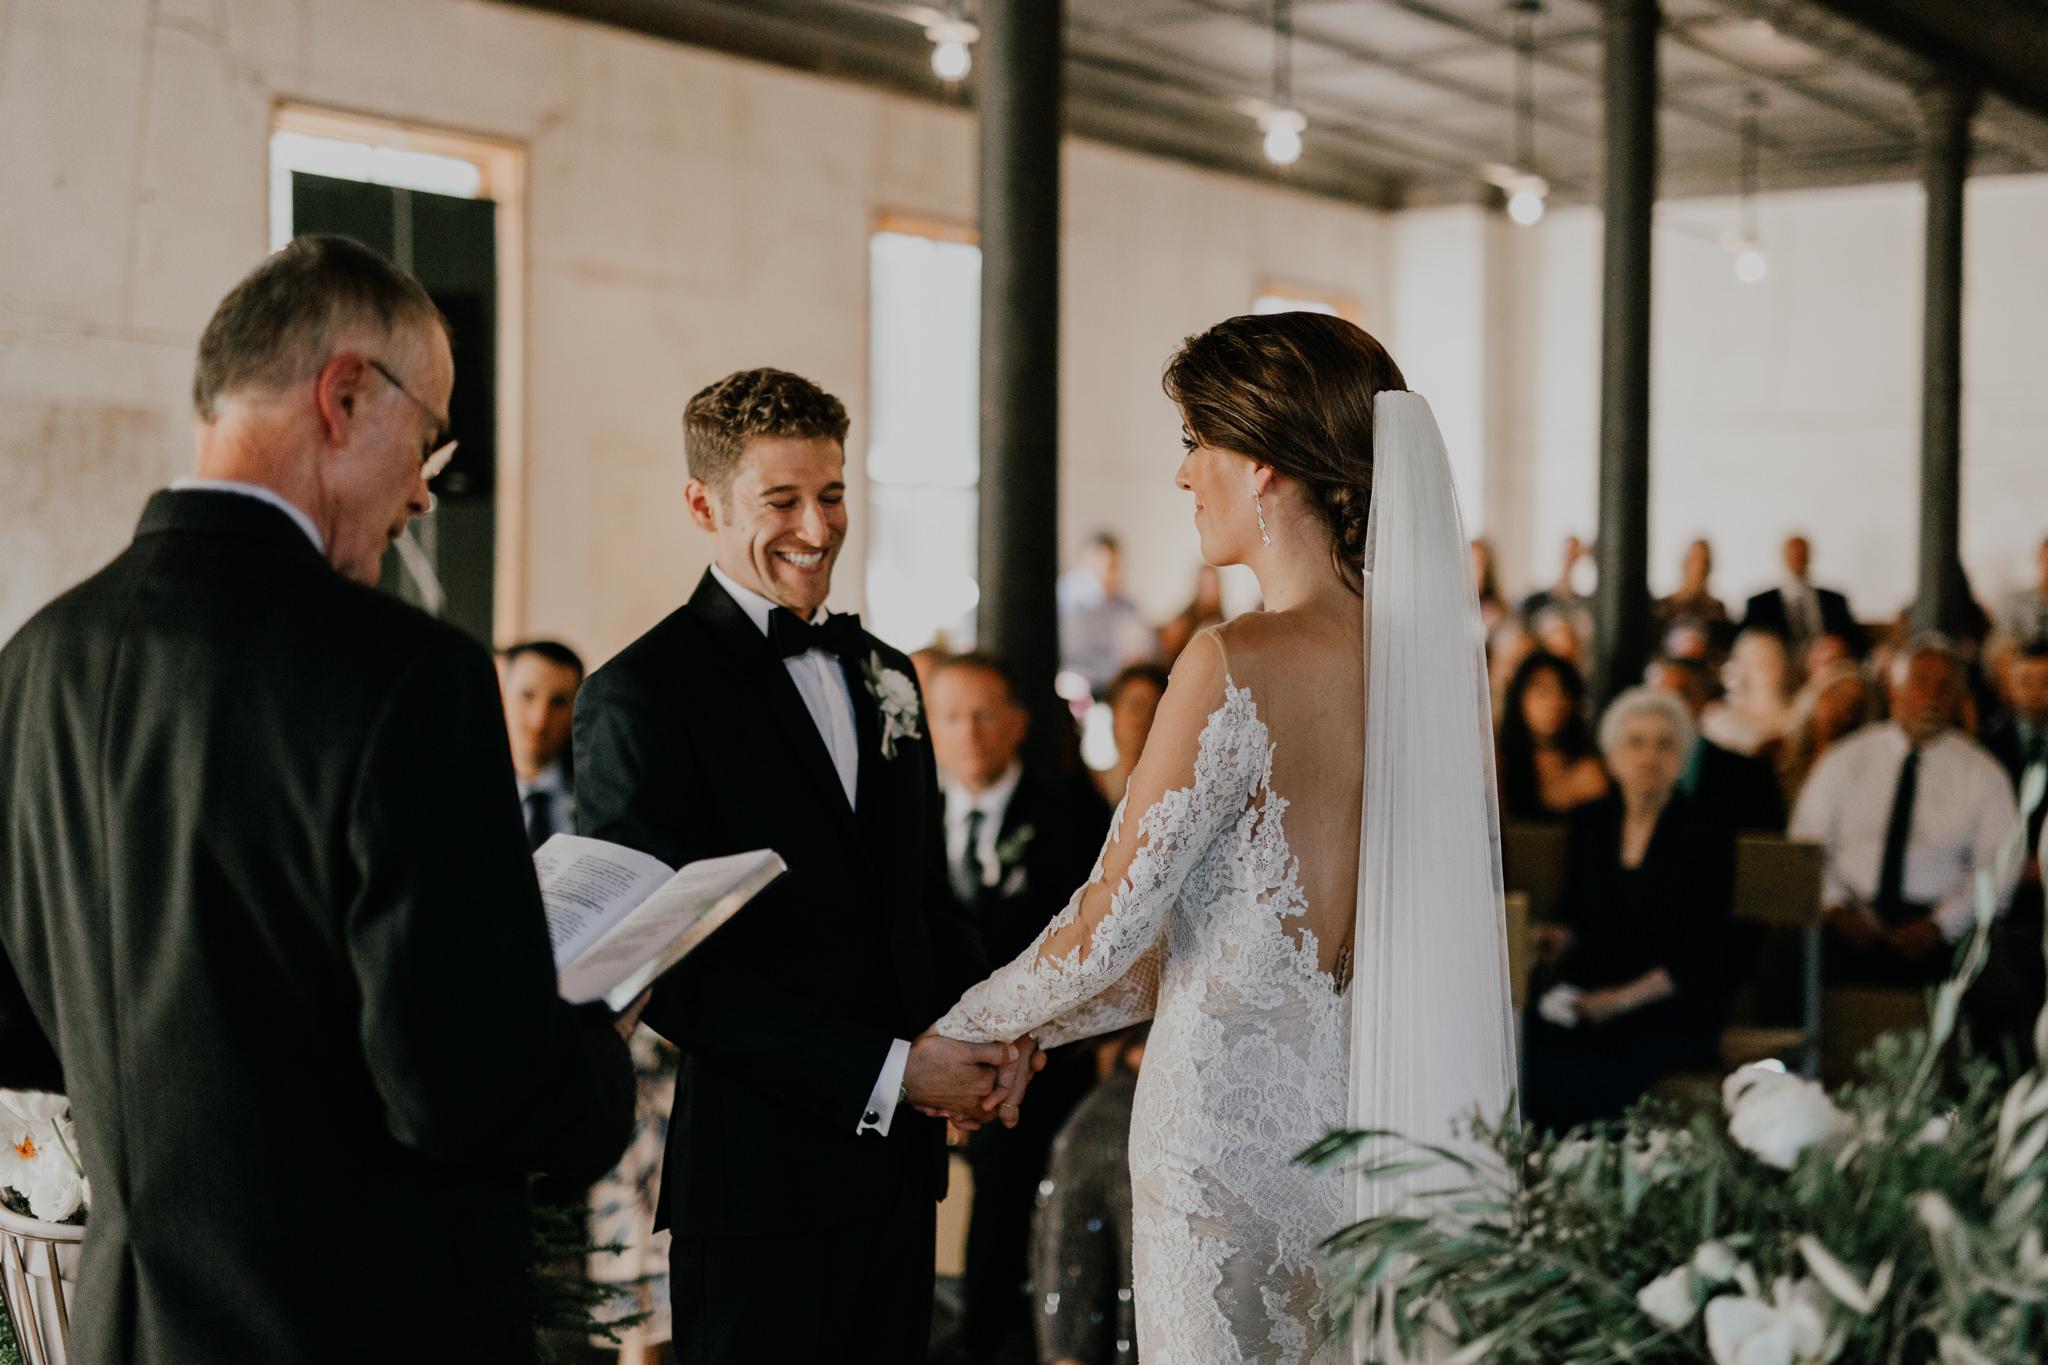 wedding-headlands-center-for-the-arts-sausalito-78.jpg